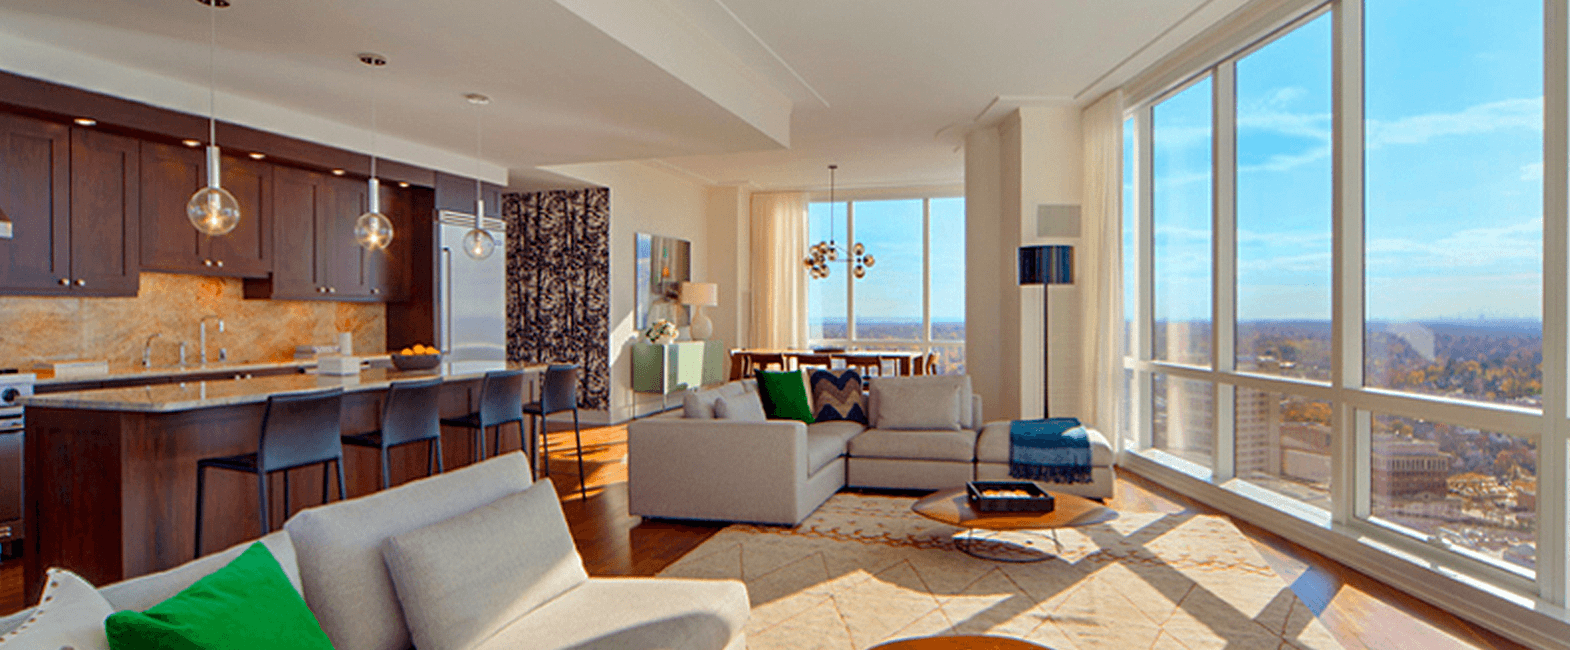 Westchester Luxury Condominium Real Estate Listings | Luxury